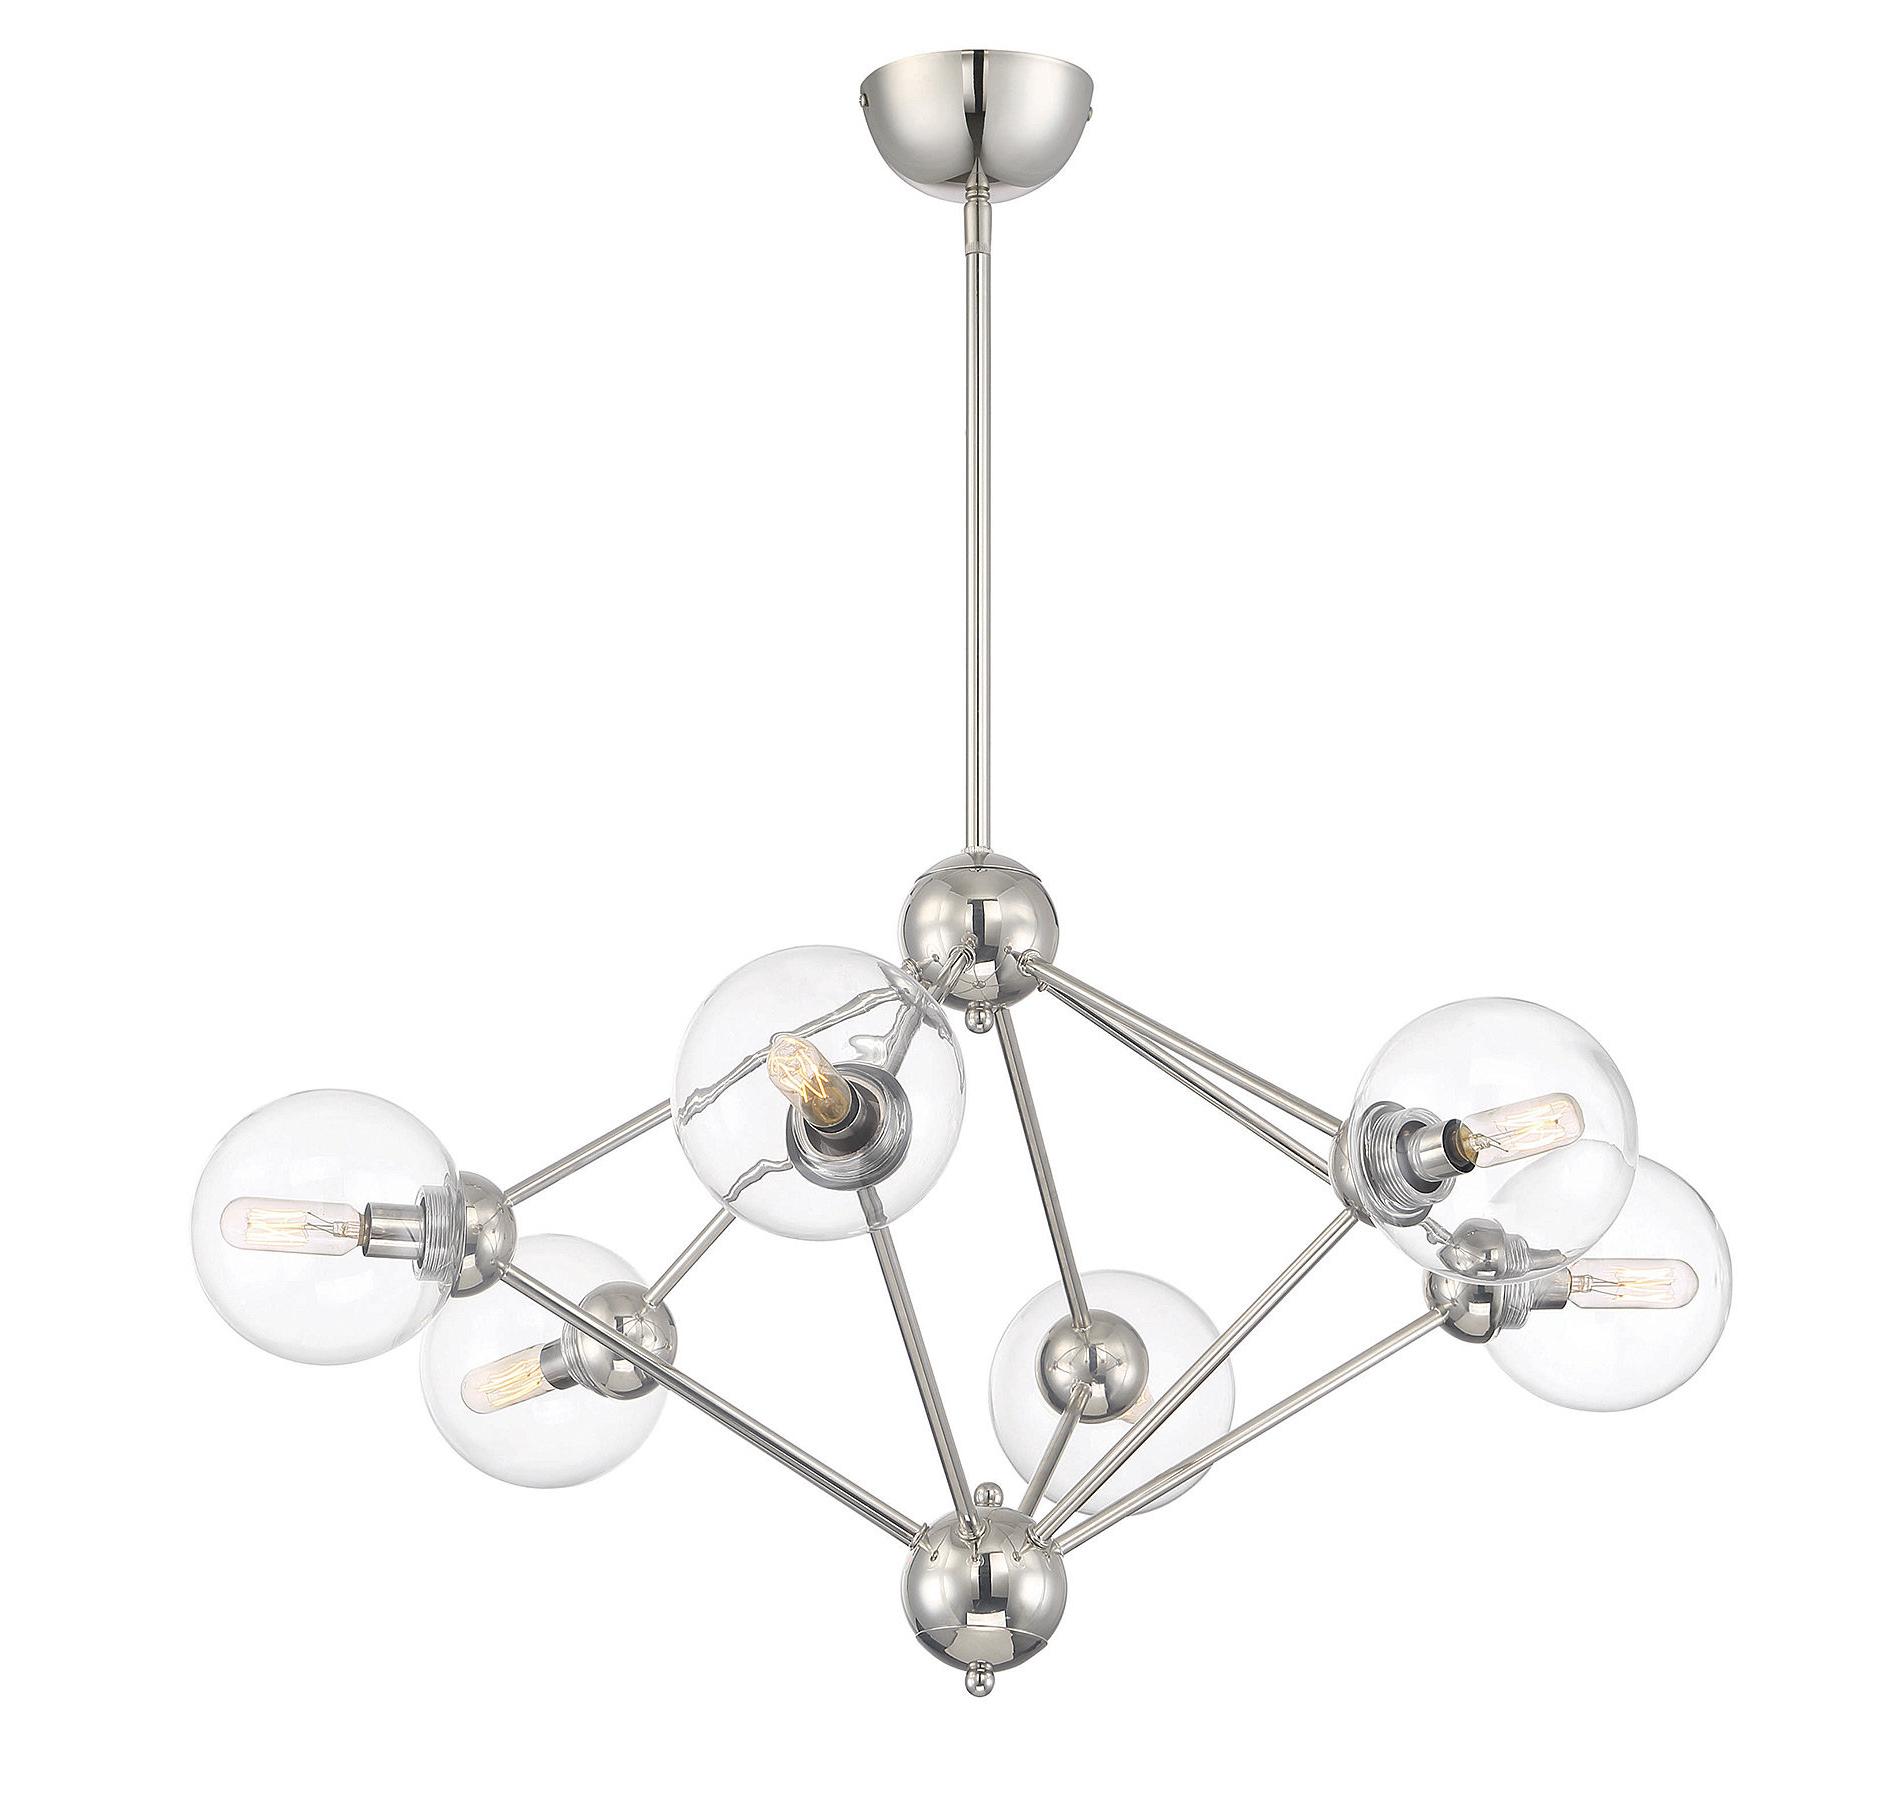 Valetta 6-Light Geometric Chandelier with 2019 Asher 12-Light Sputnik Chandeliers